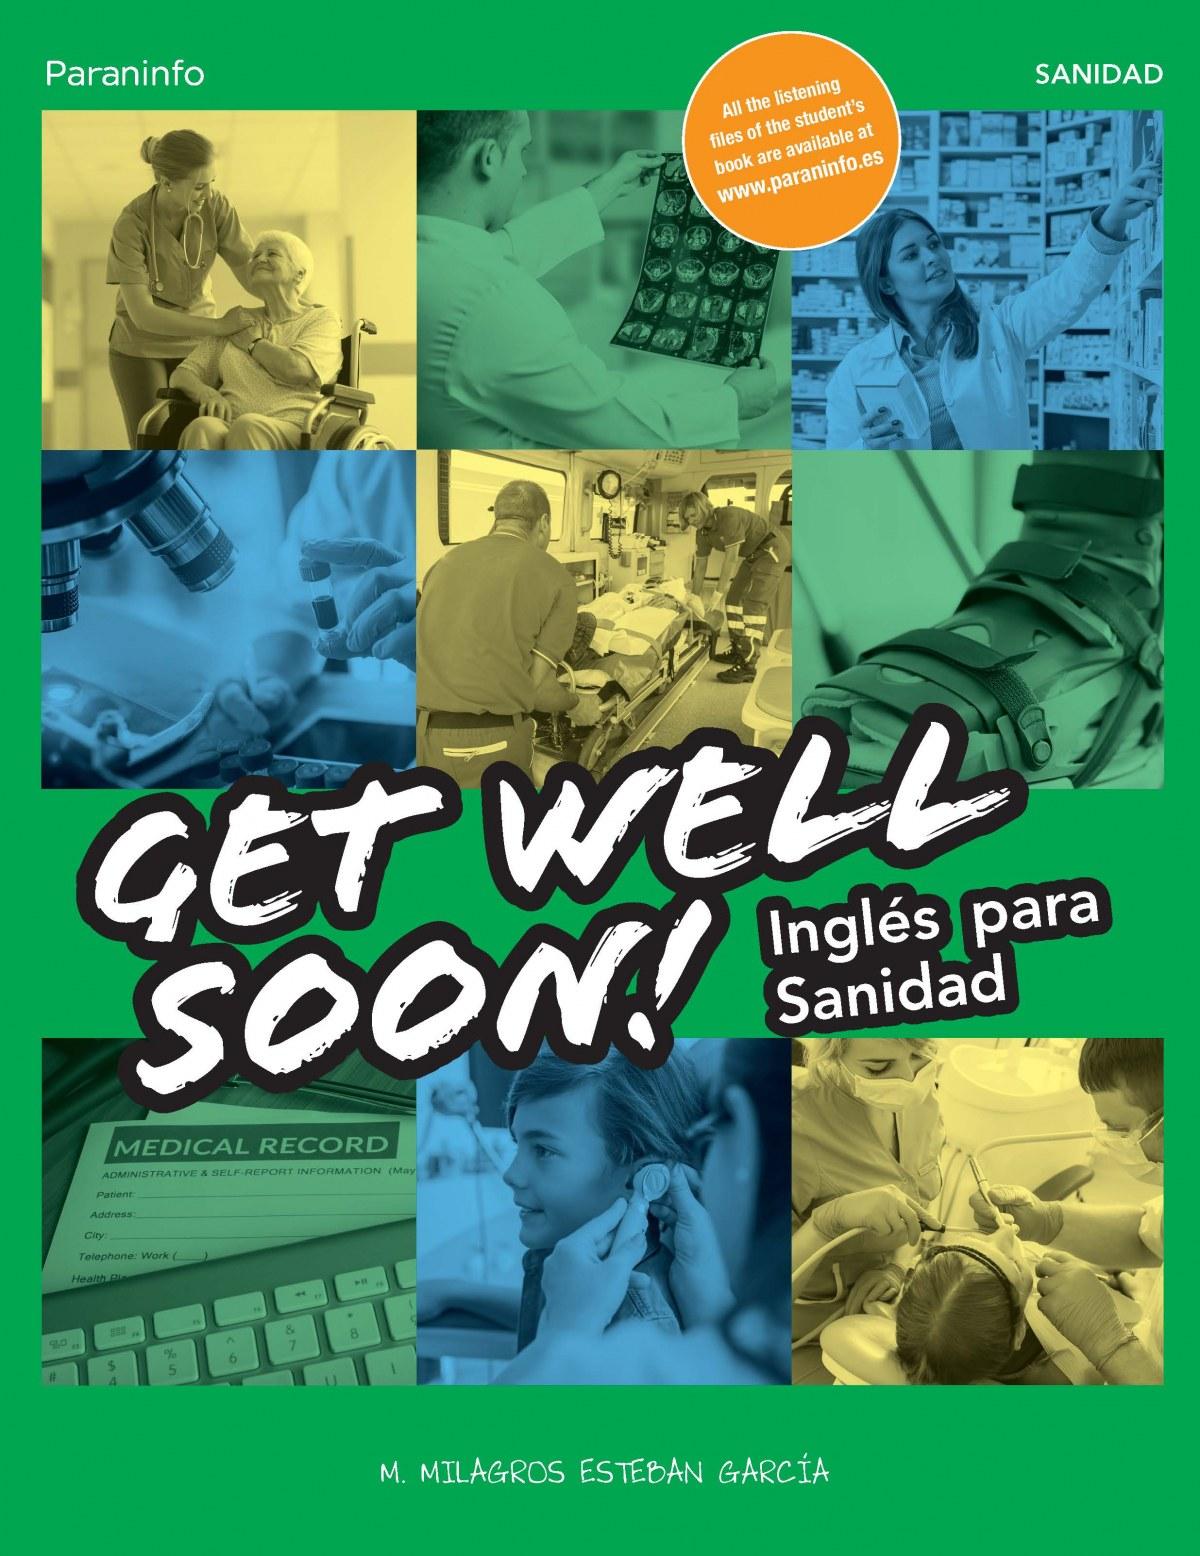 Get Well Soon! Inglés para sanidad